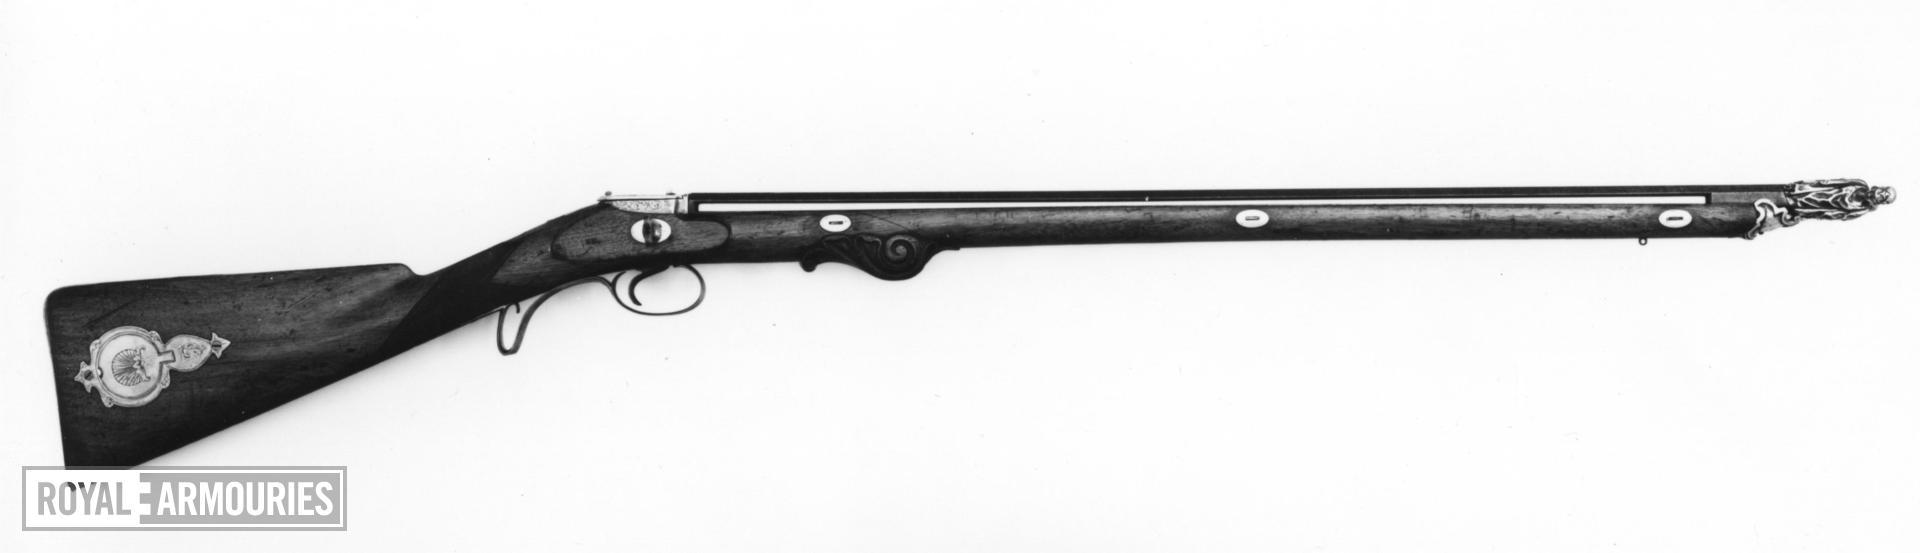 Elastic gun